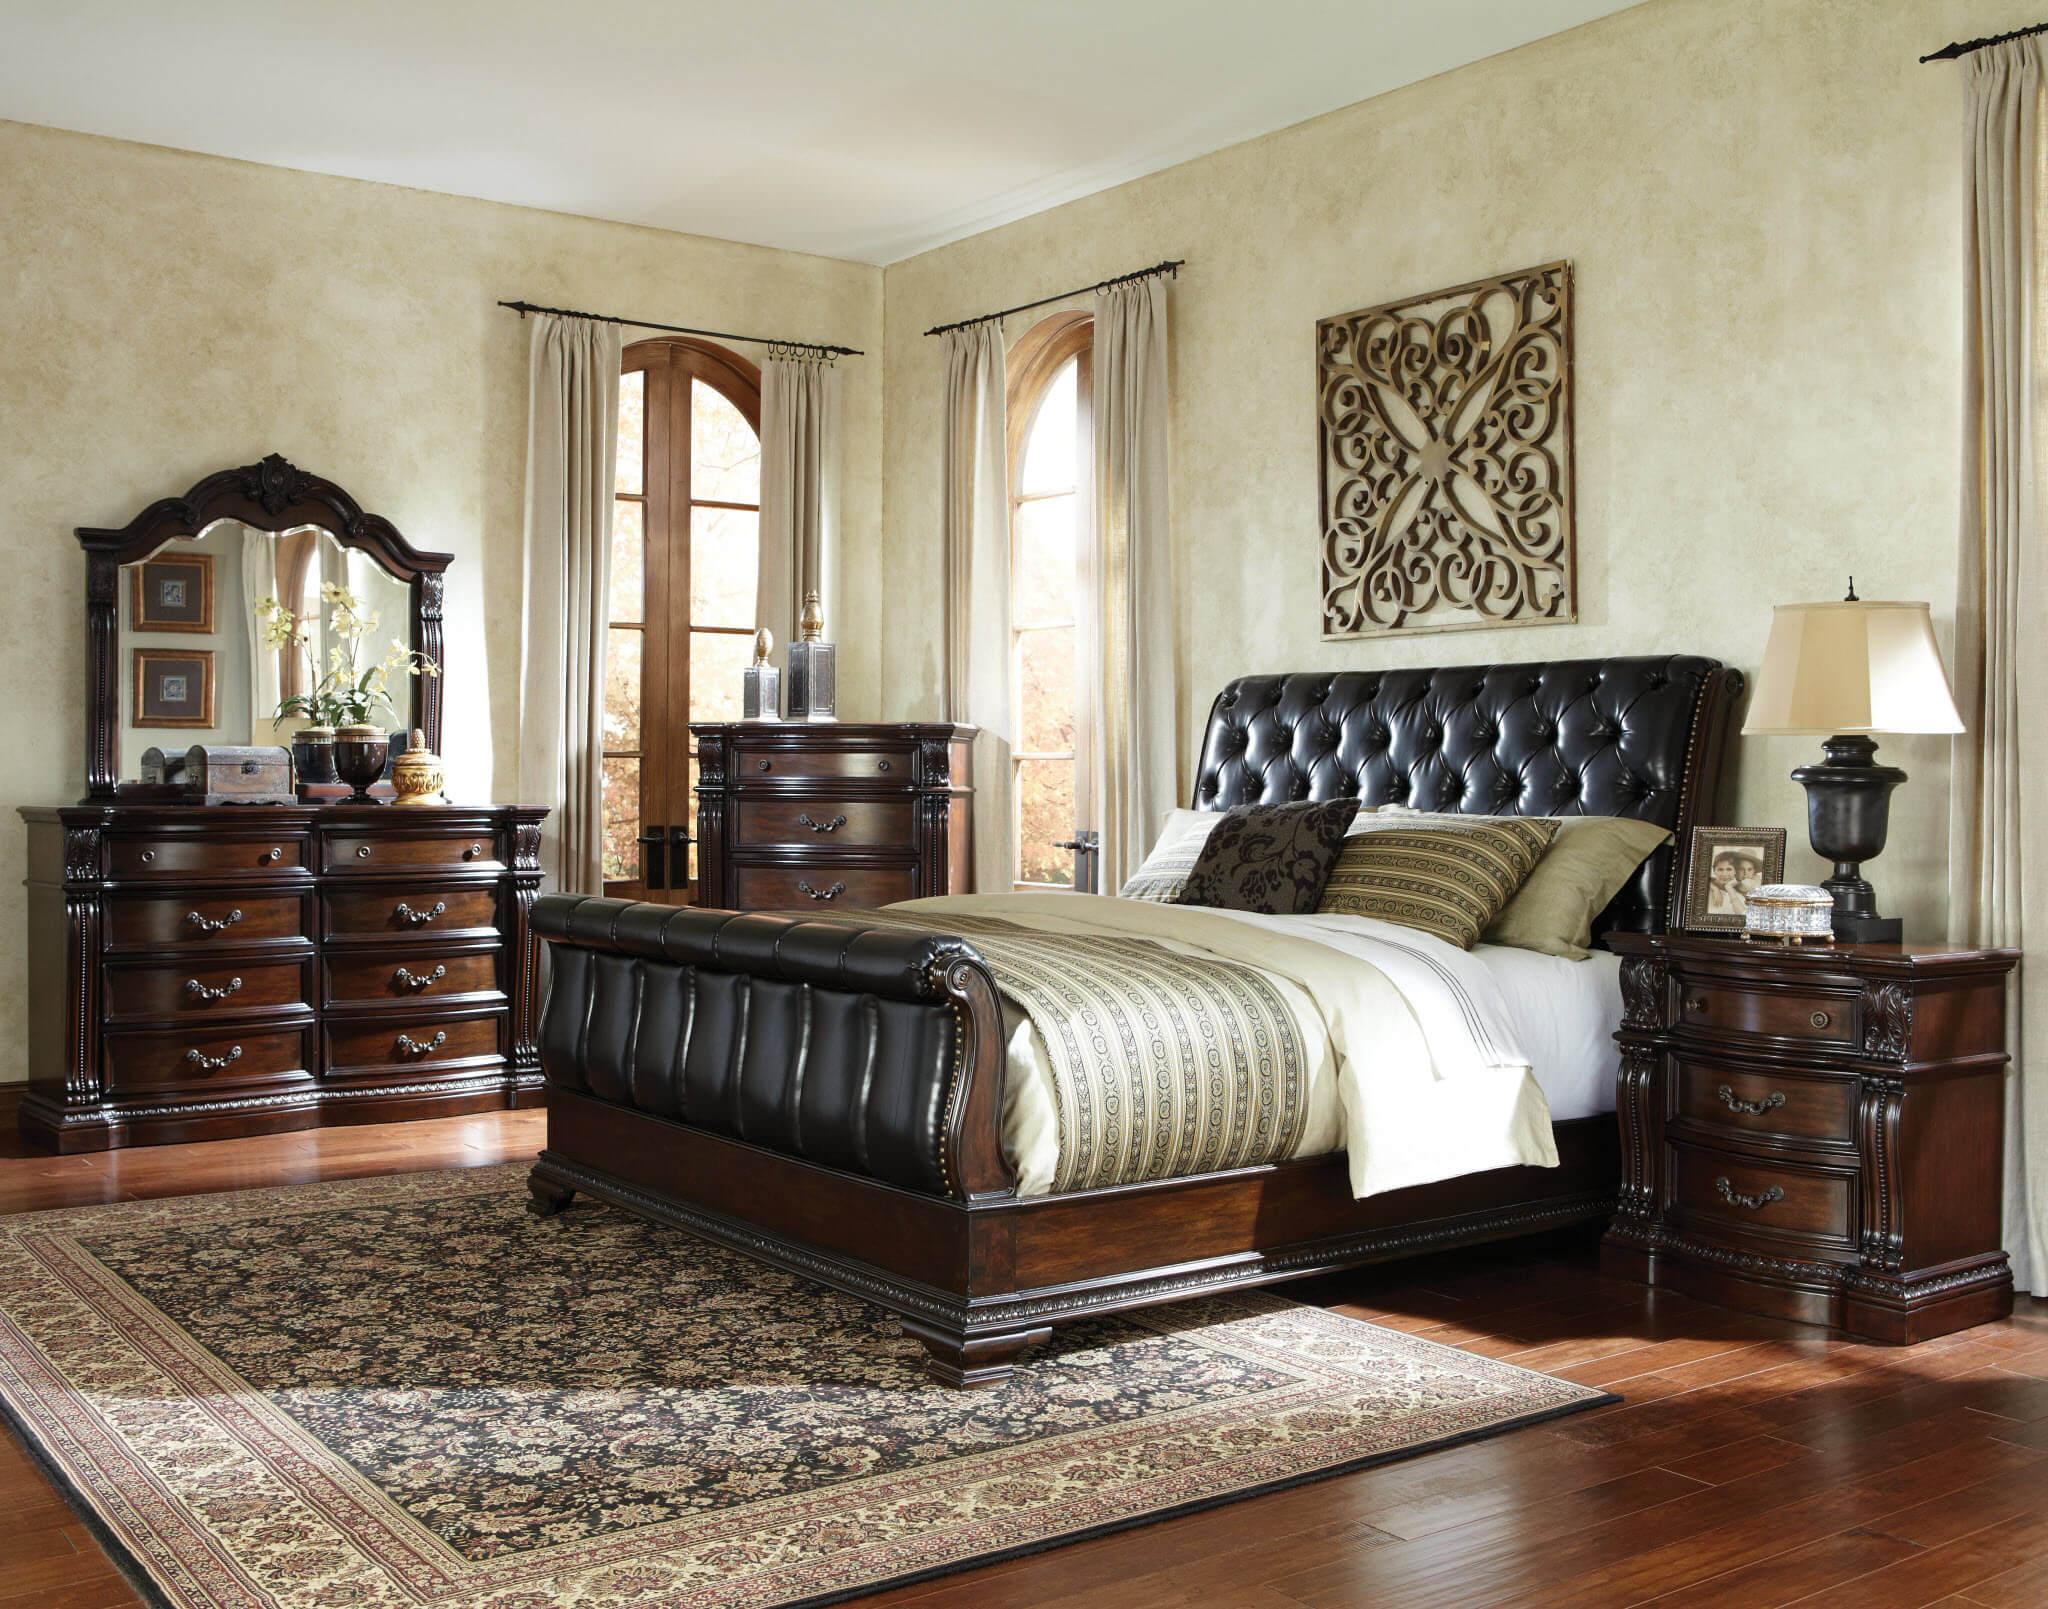 Churchill sleigh bedroom set bedroom furniture sets